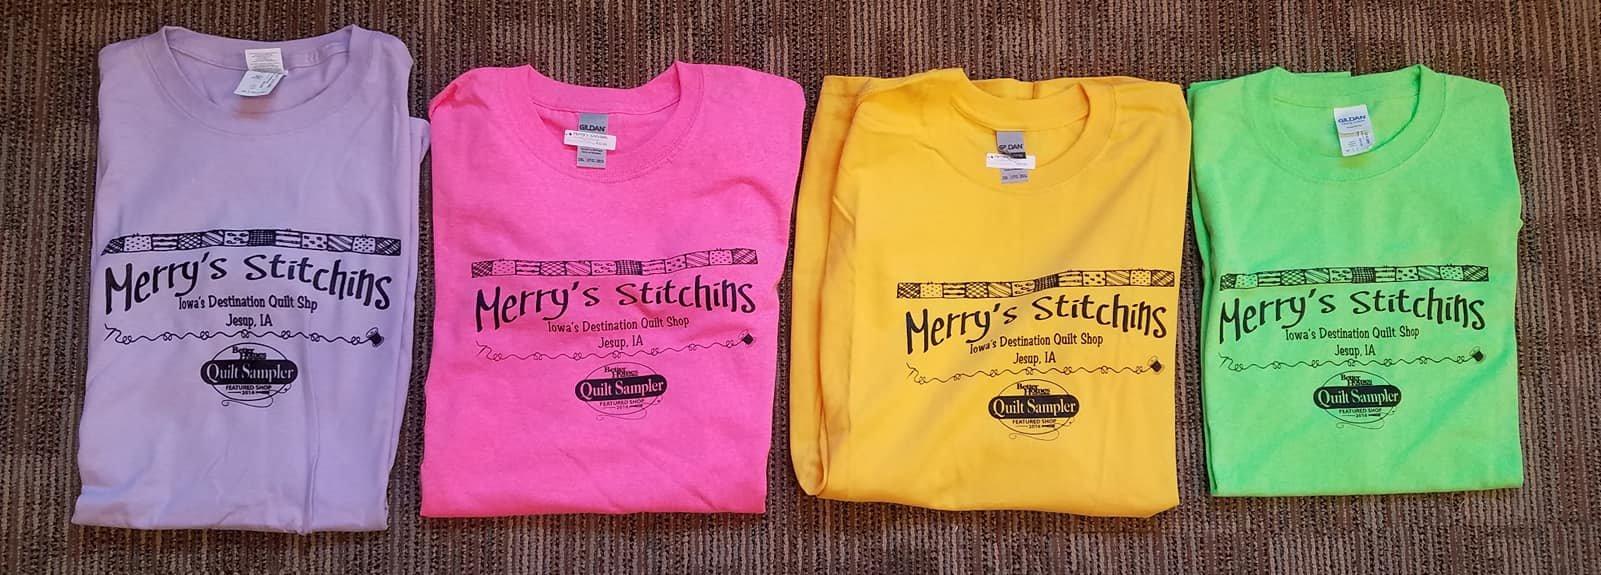 Merry's Stitchins T-Shirt